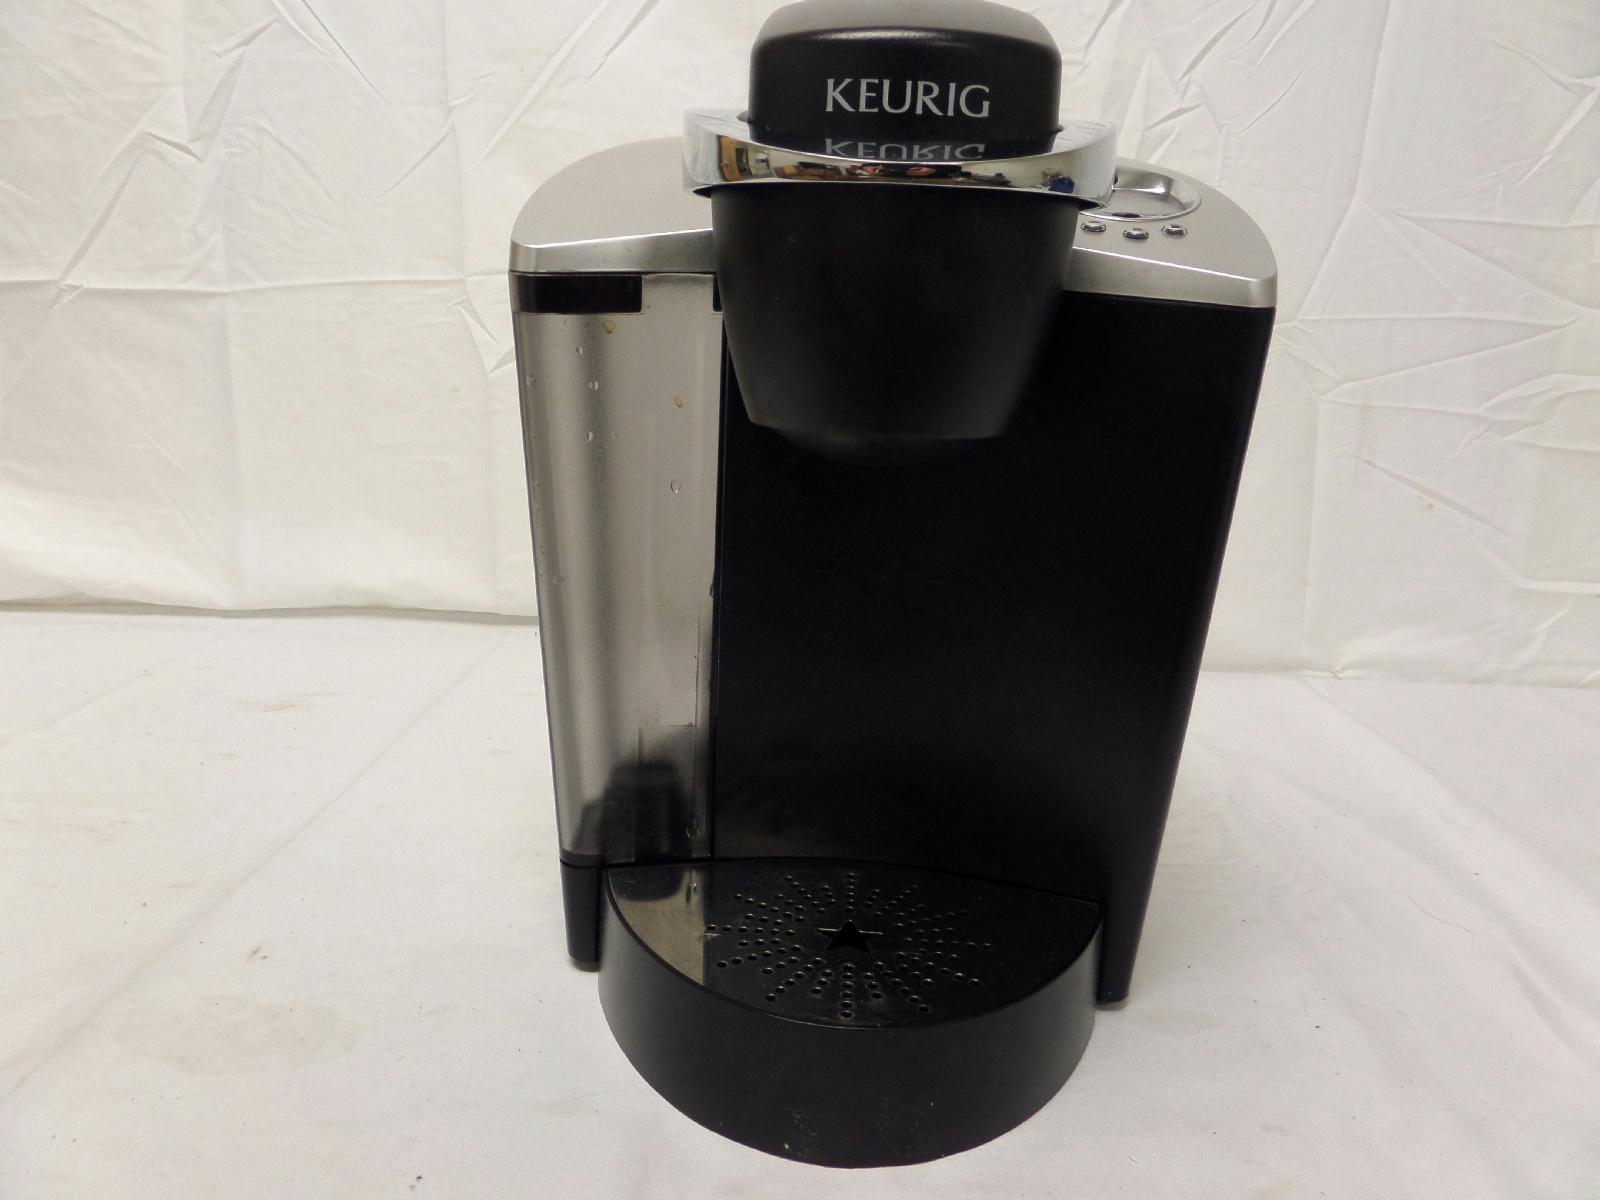 Coffee Maker Keurig B60 : Keurig B60 Special Edition Gourmet Single Cup Home Brewing System .html Autos Weblog